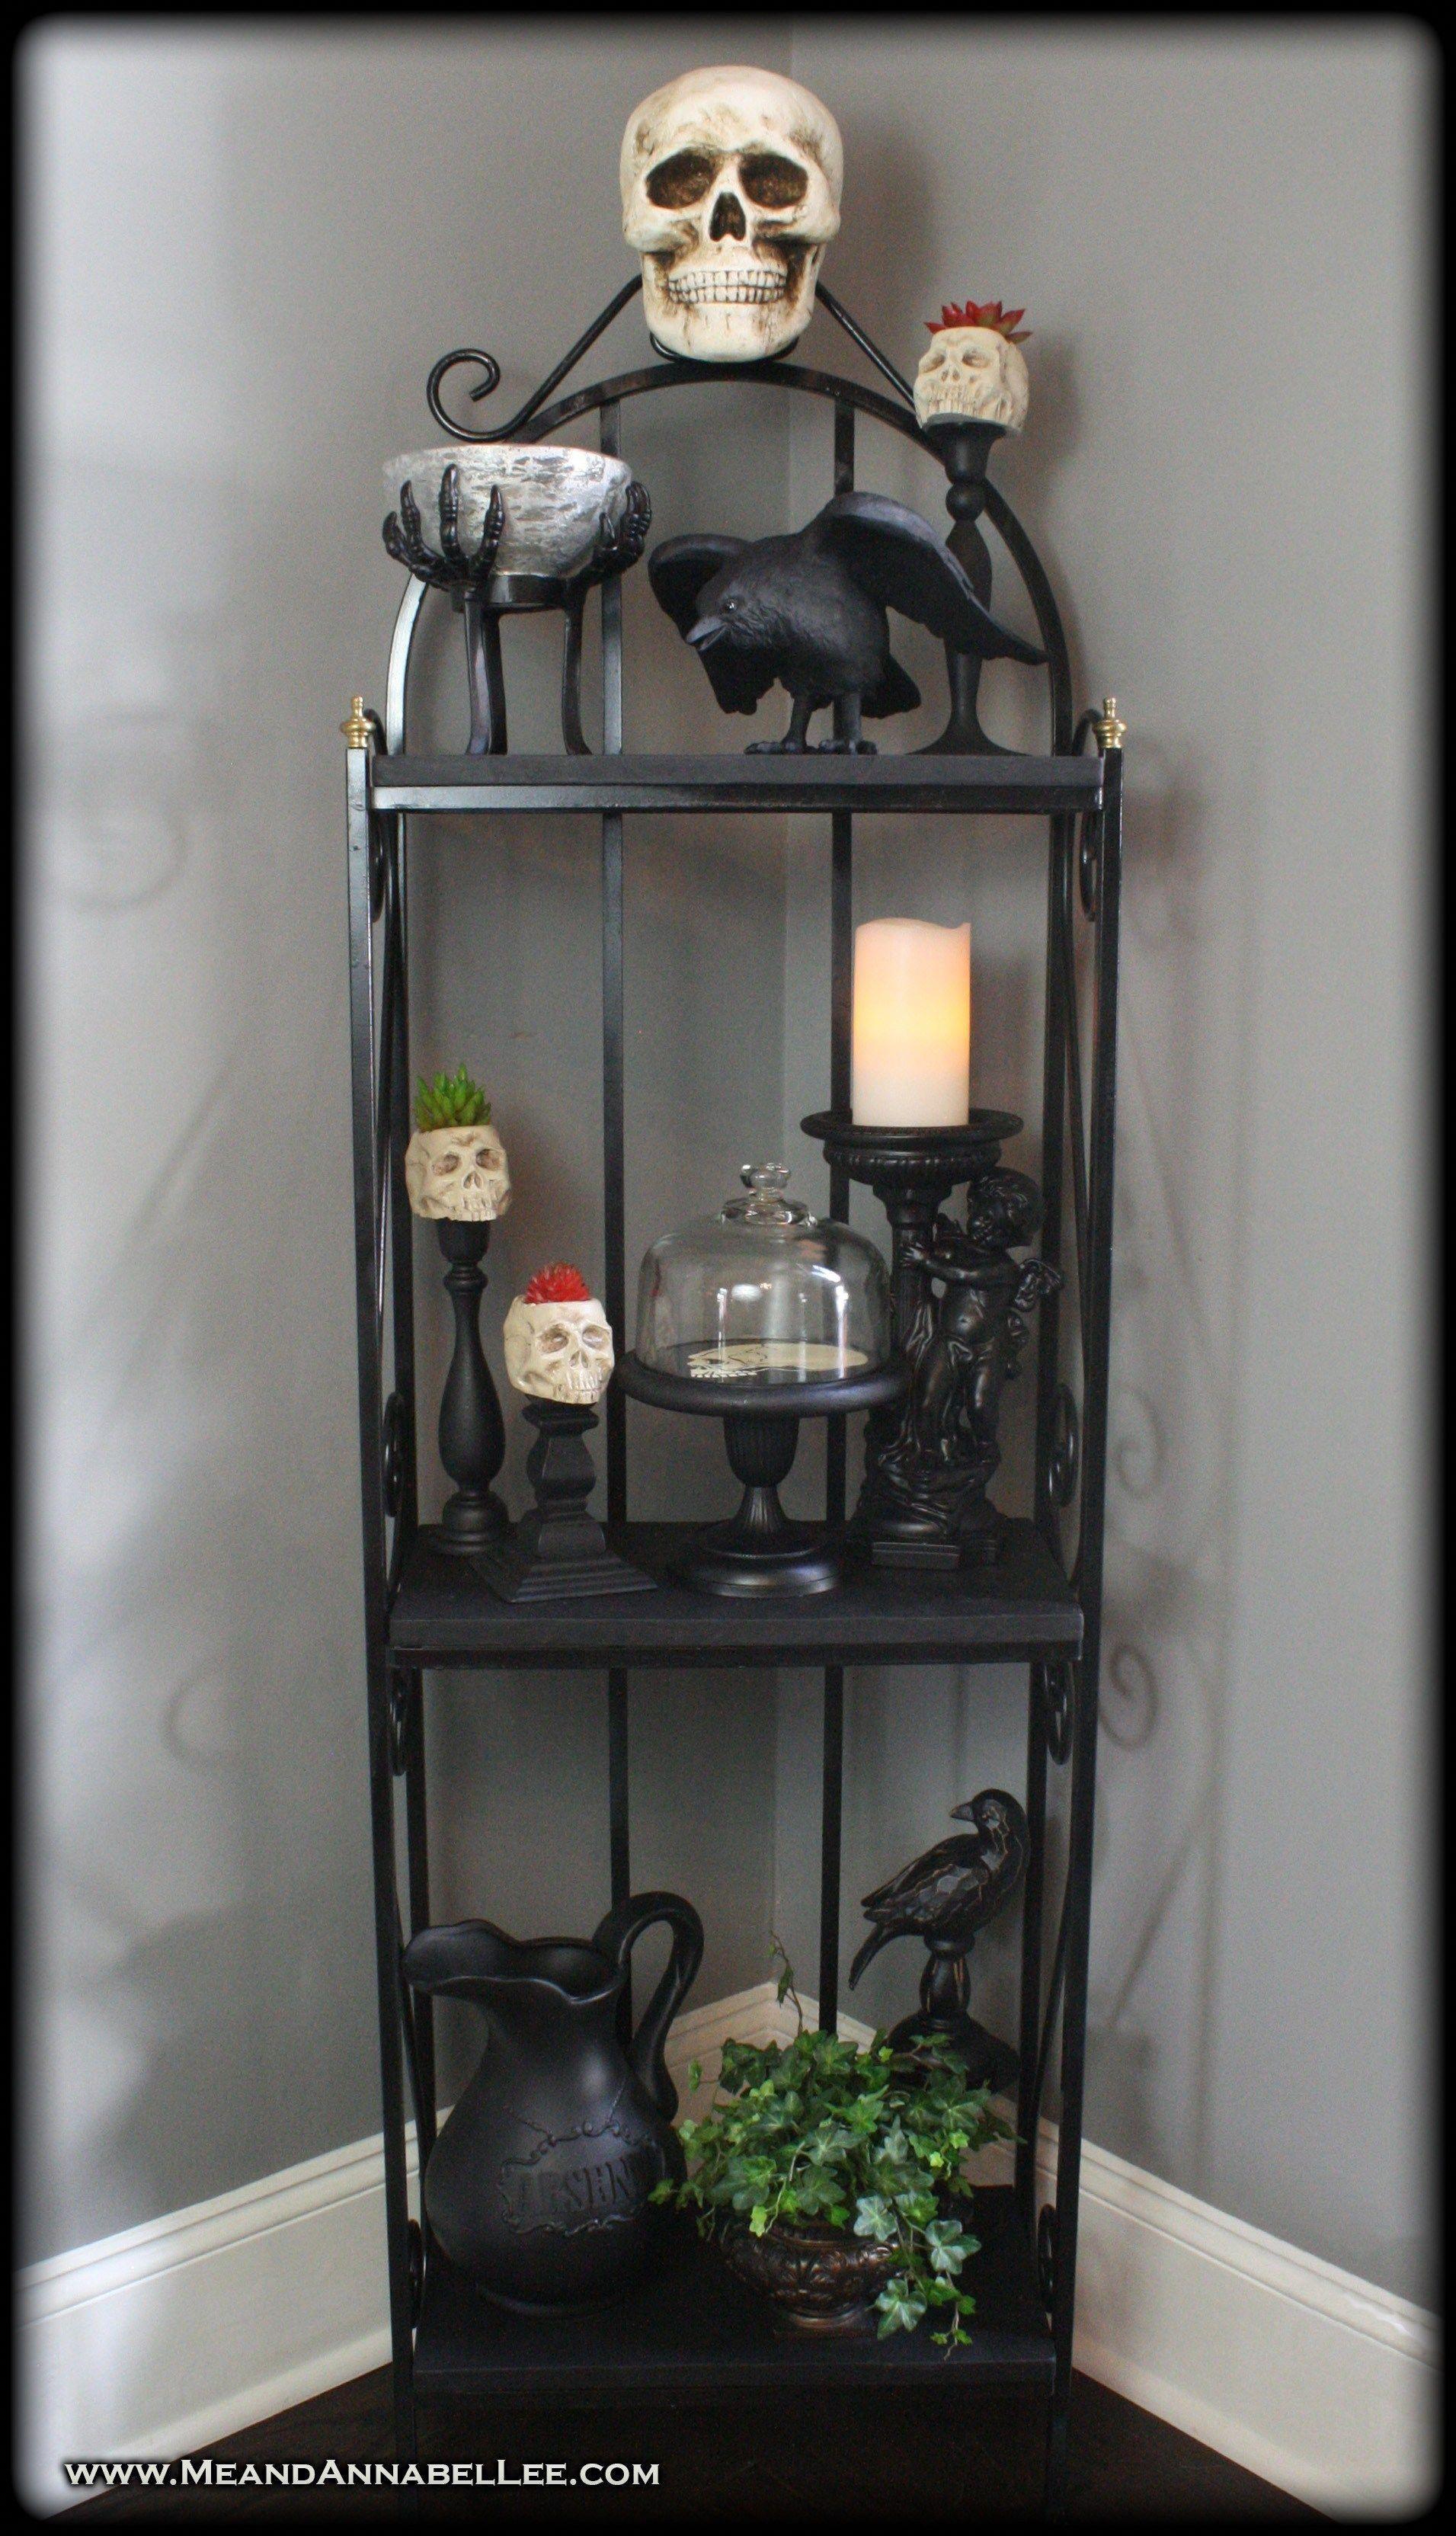 DIY Gothic Skull Baker's Rack Shelf Goth It Yourself